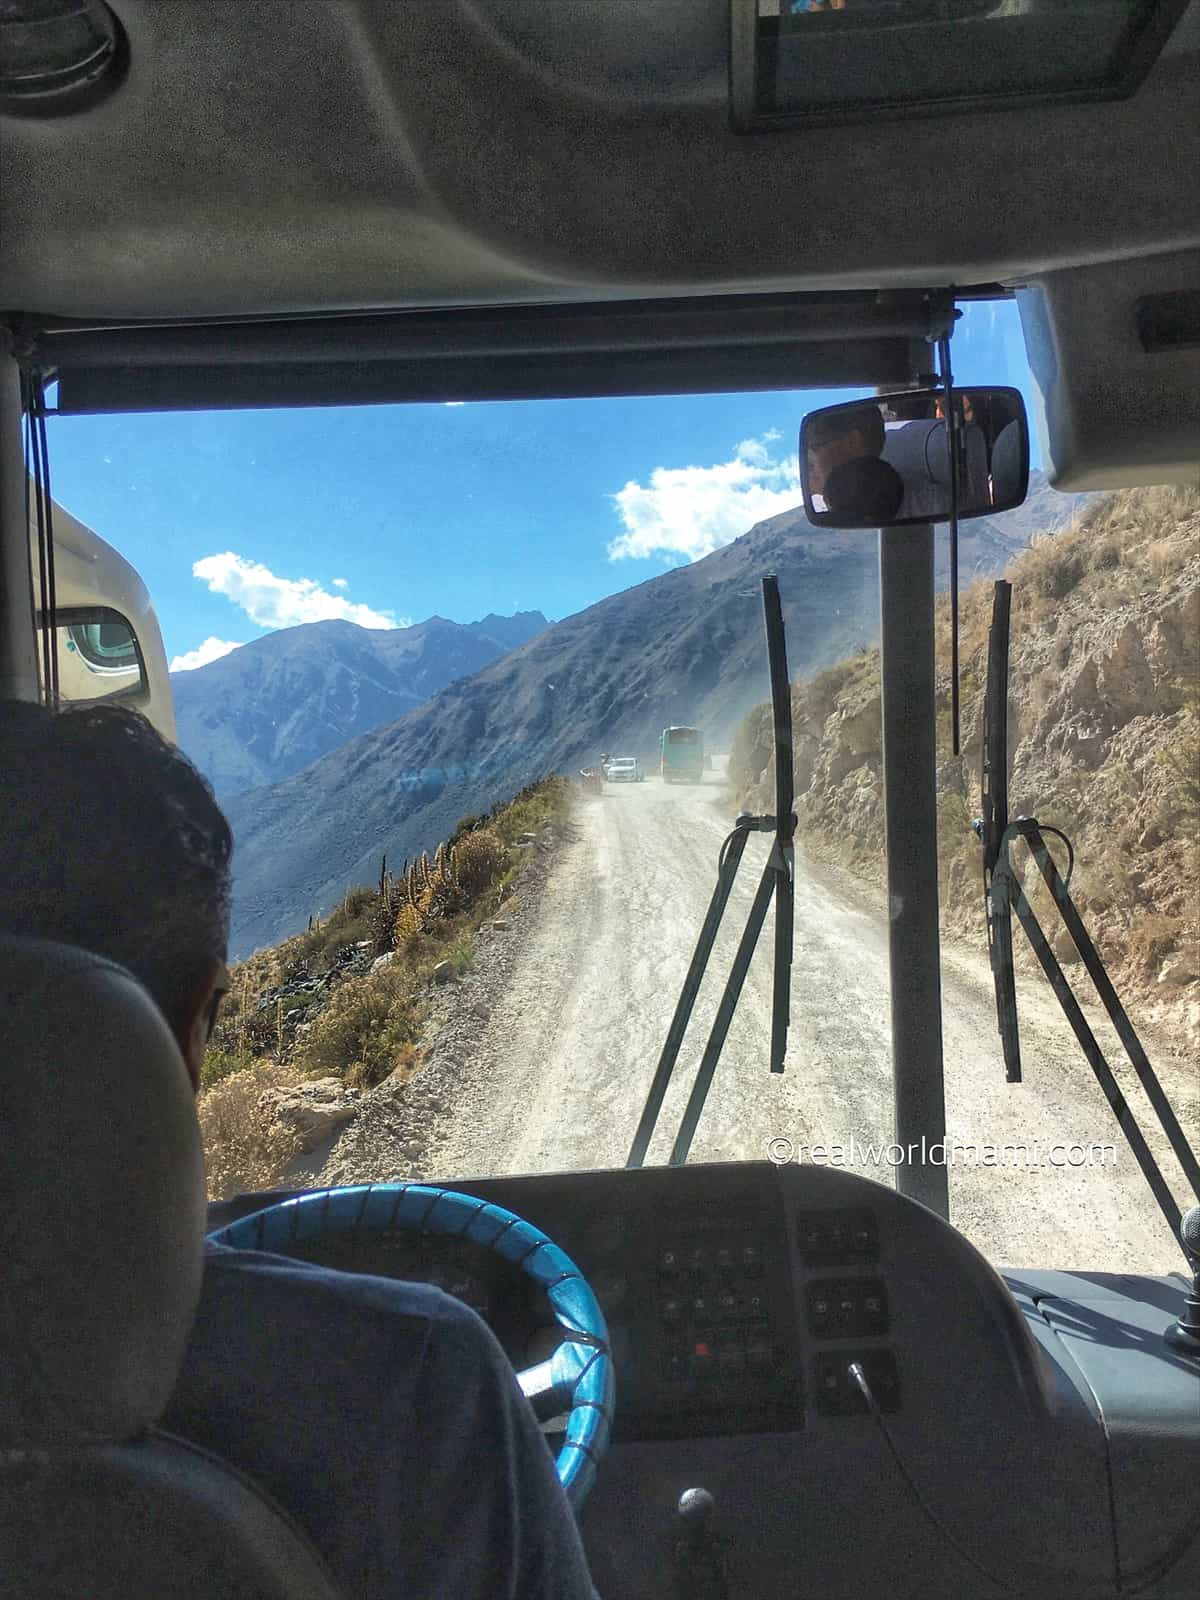 A dusty road